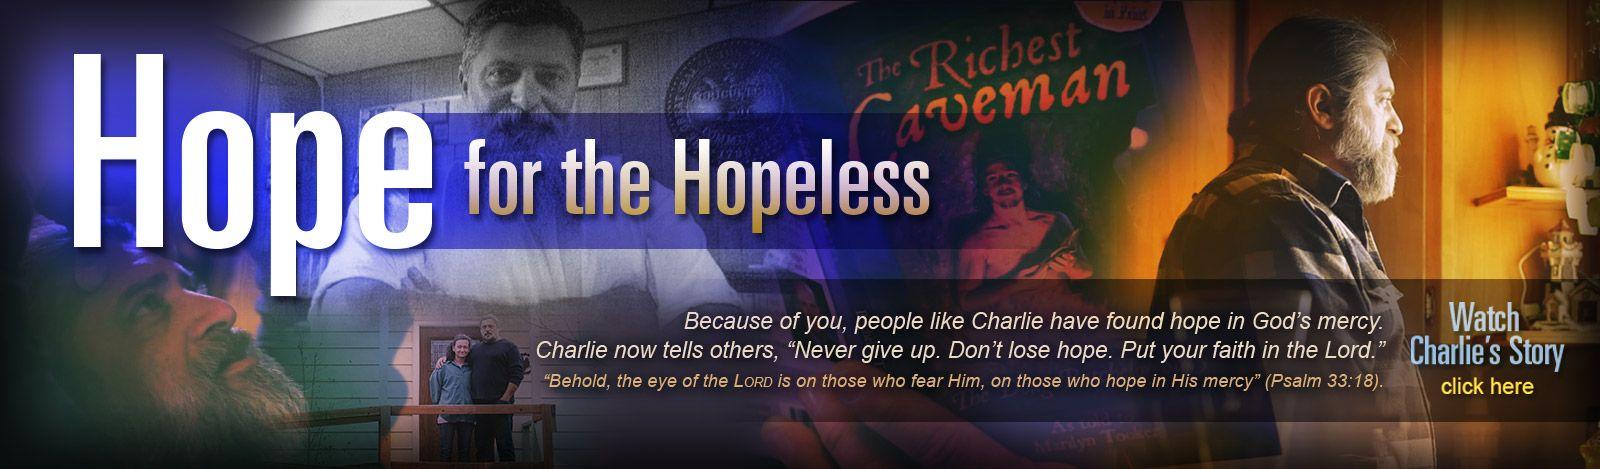 Testimony - Charlie